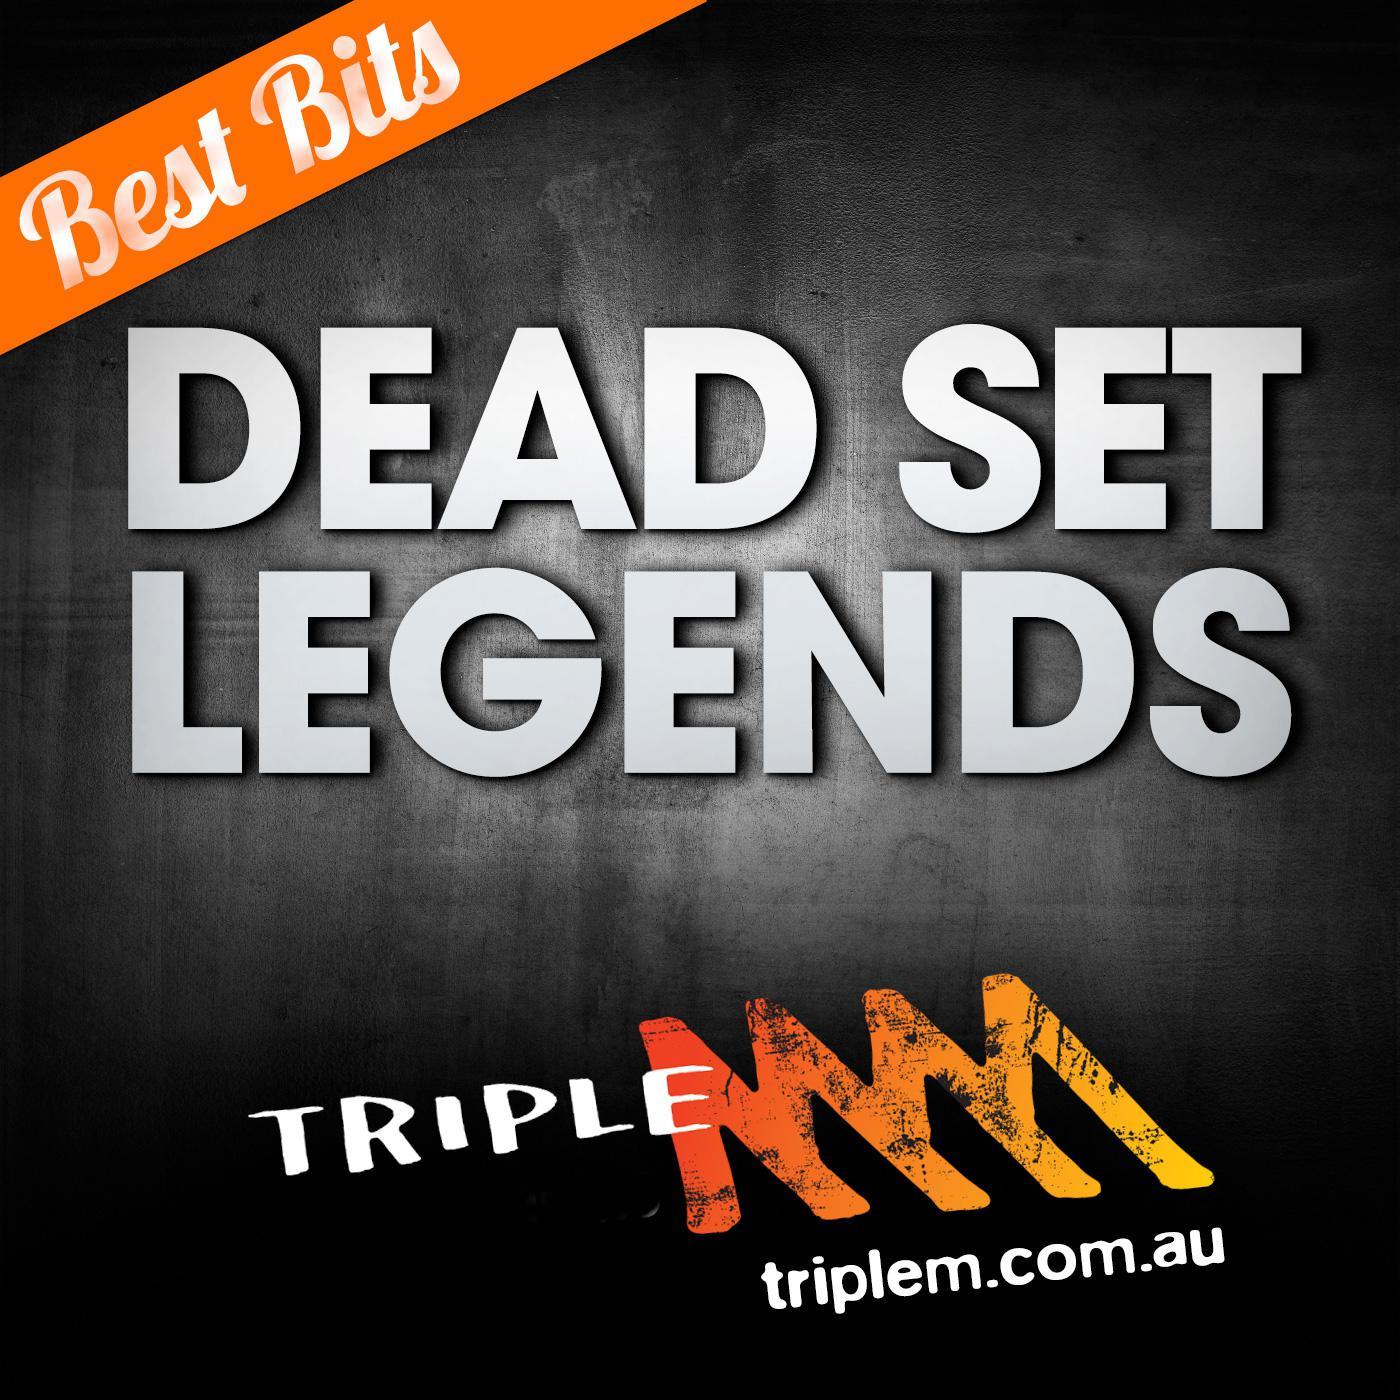 Dead Set Legends Melbourne: Best Bits